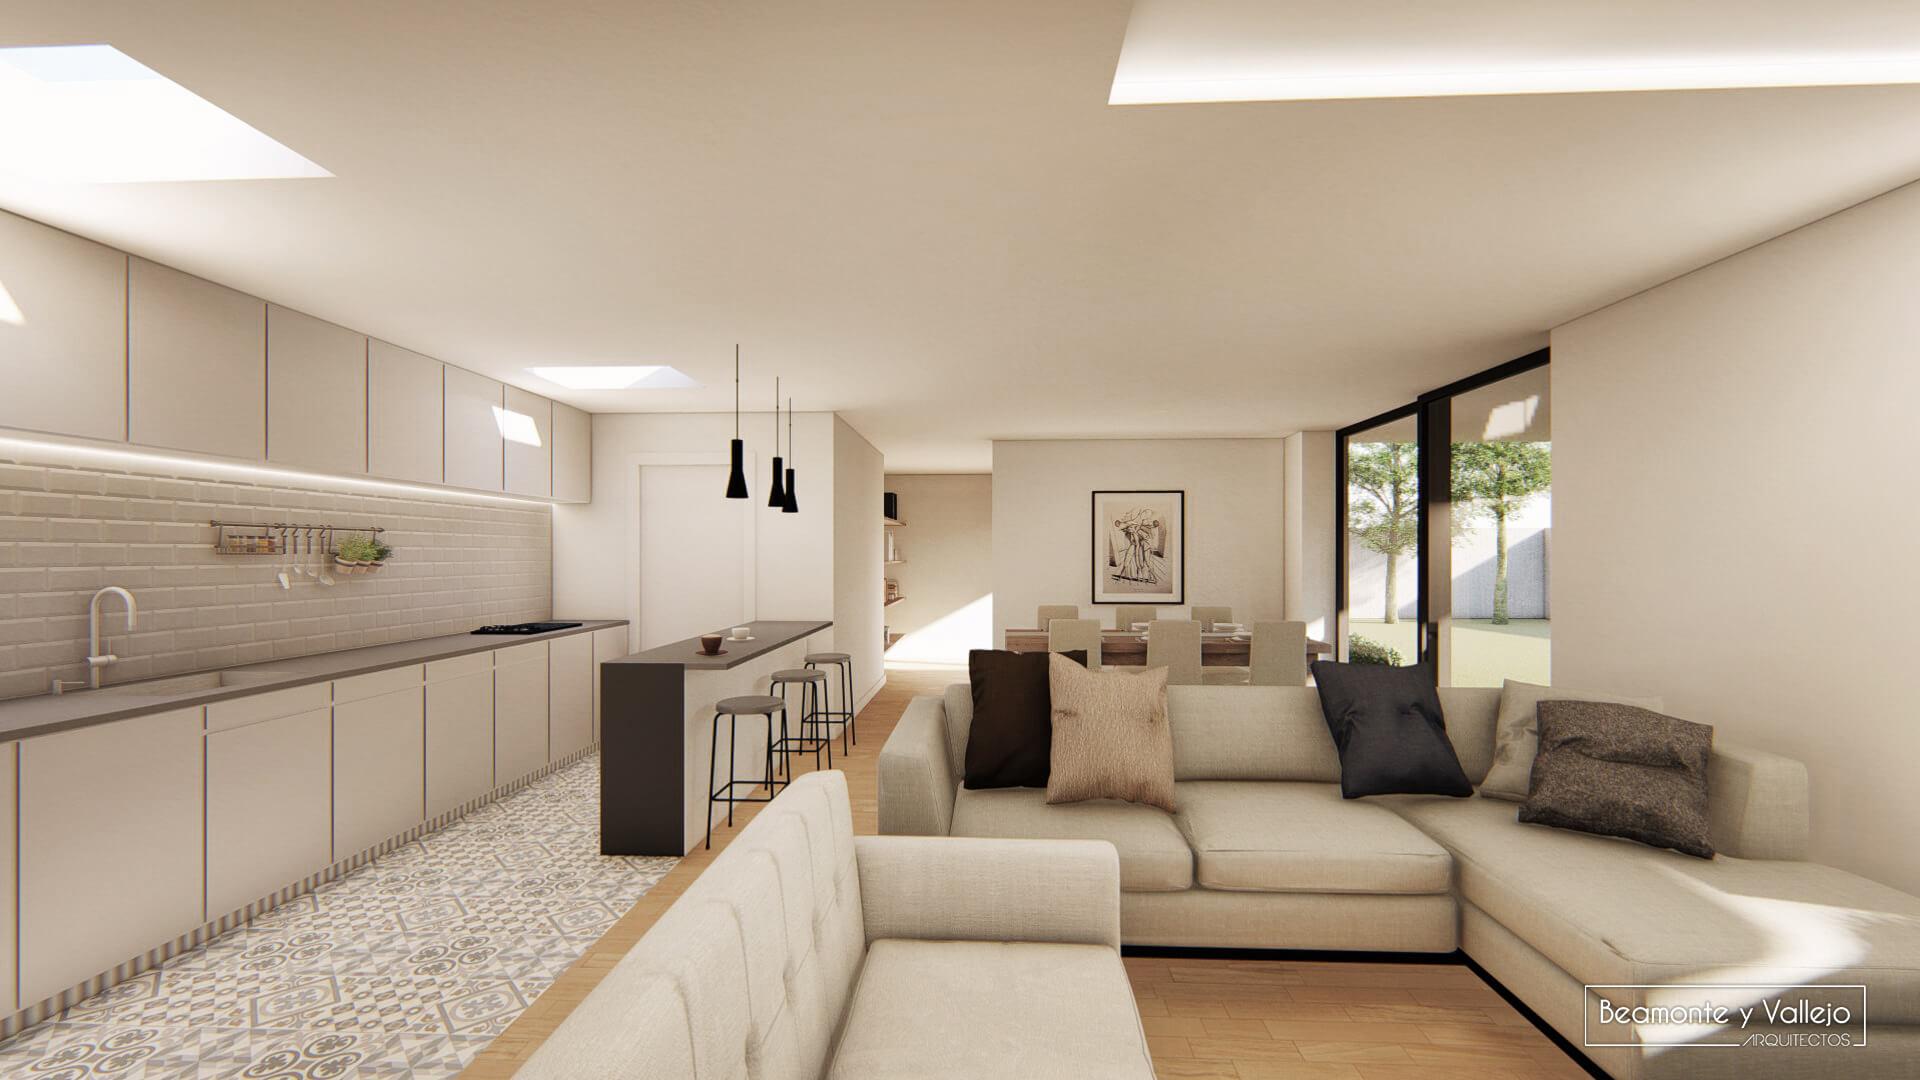 Beamonte y Vallejo Arquitectos - Passivhaus Pradejón 2